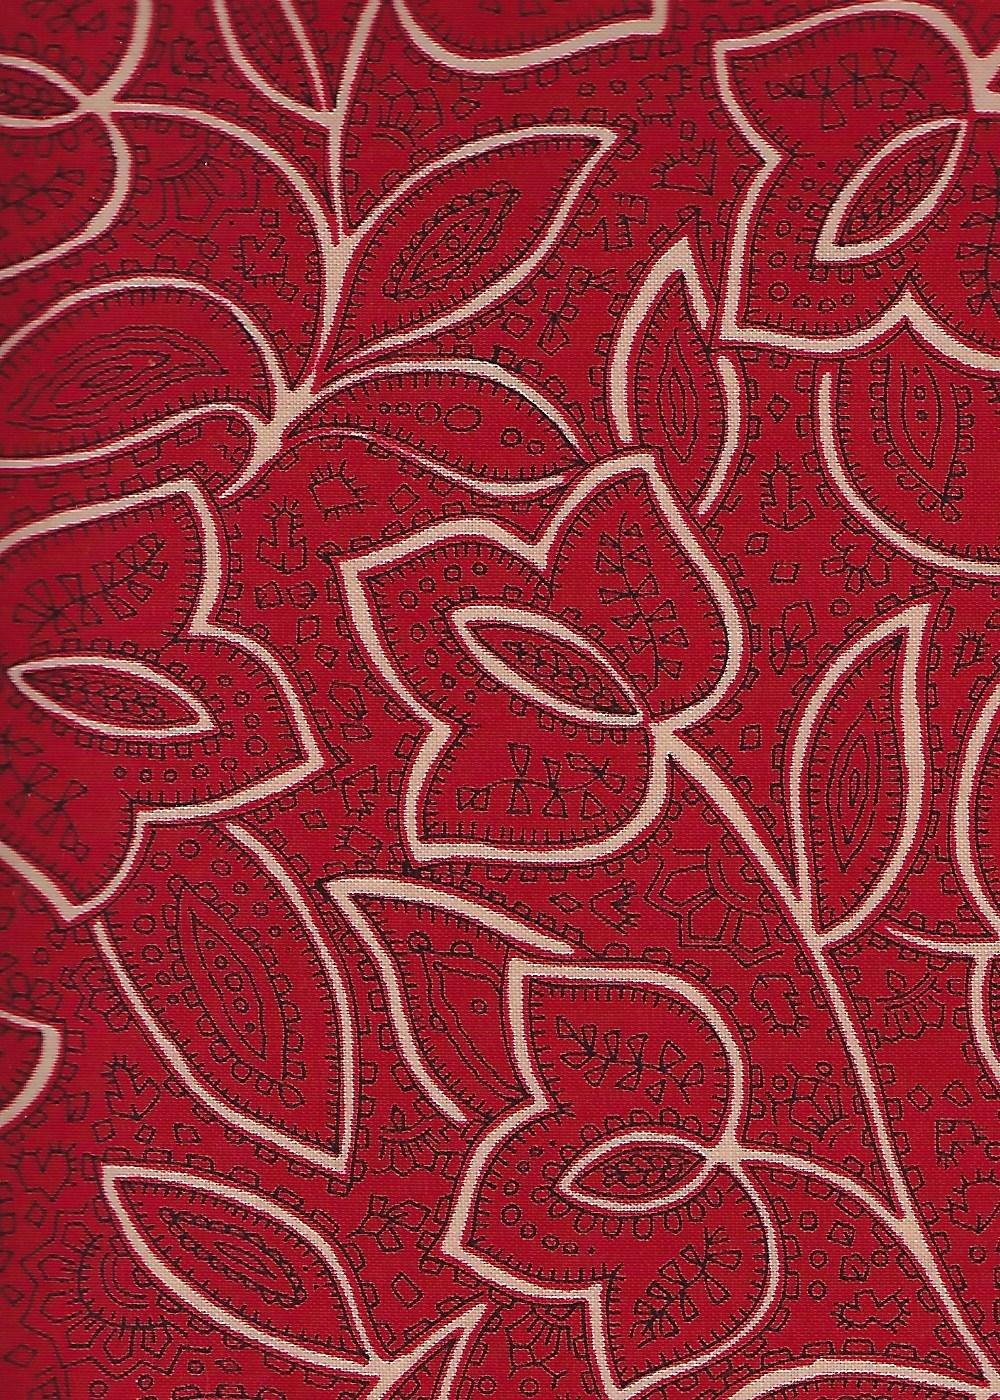 Montana Bandana 5500 rED  Alexander Henry Fab 100% Cotton Fabric - copy